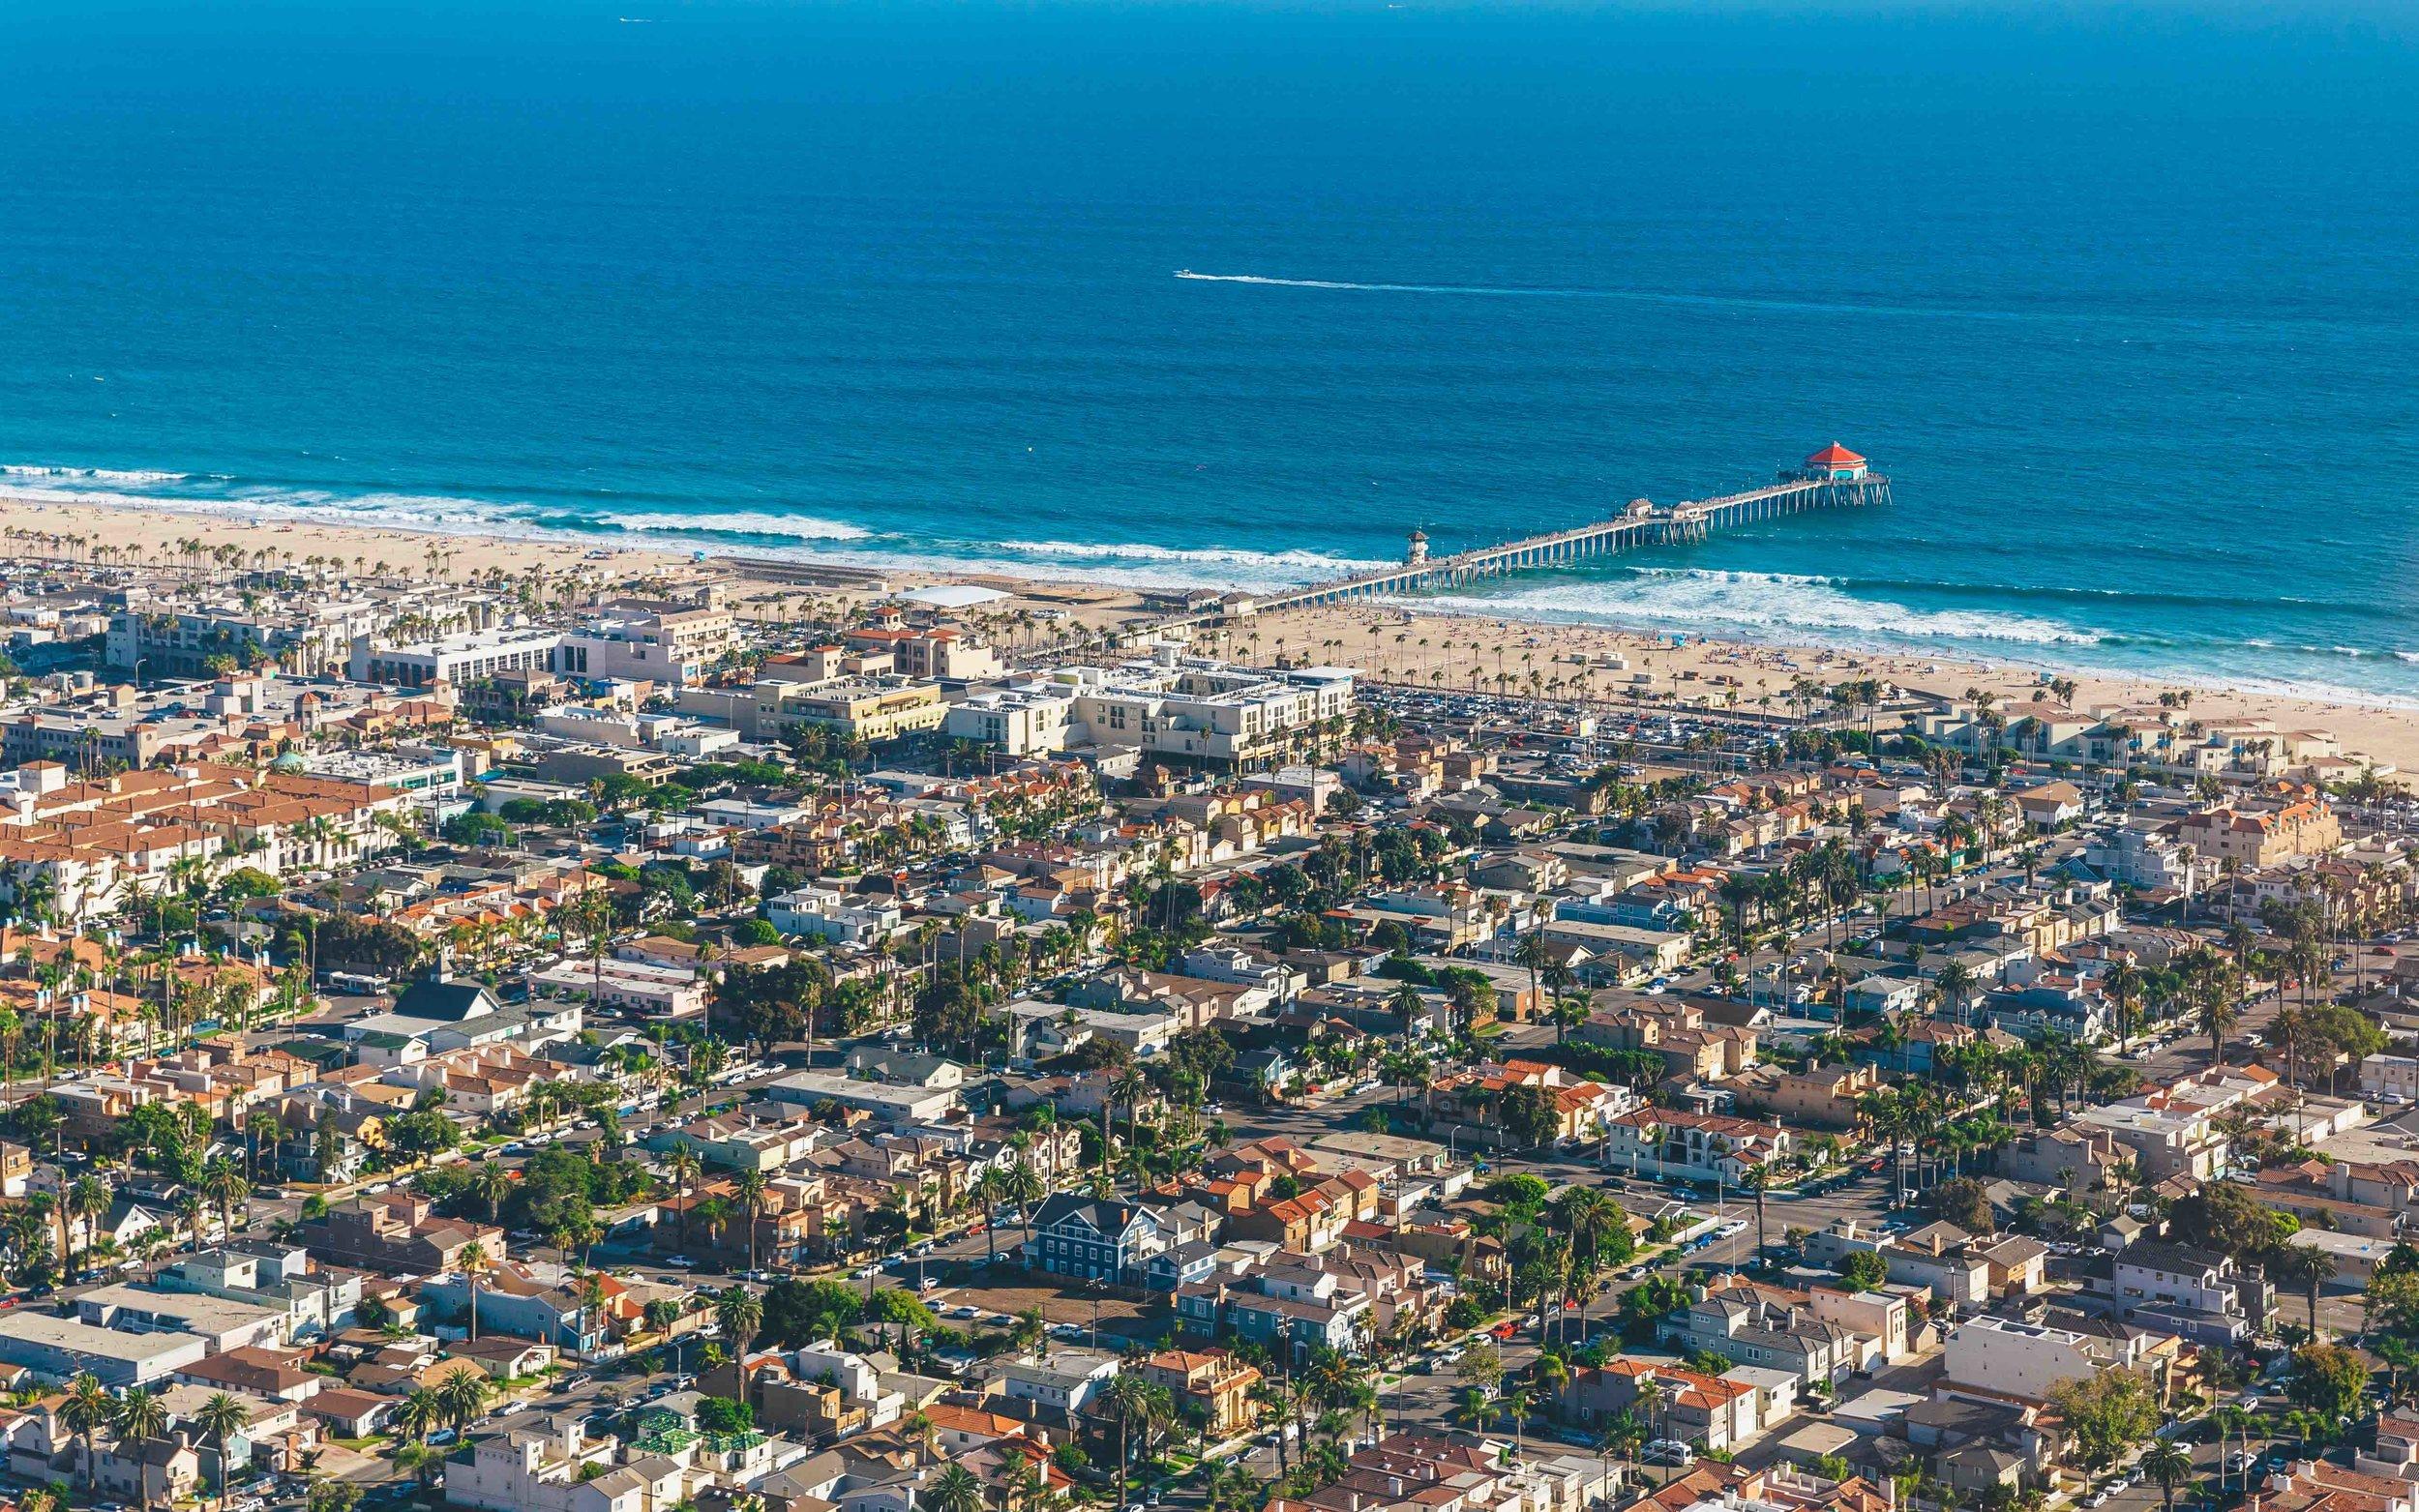 2015-LA-Aerial-001-sm.jpg